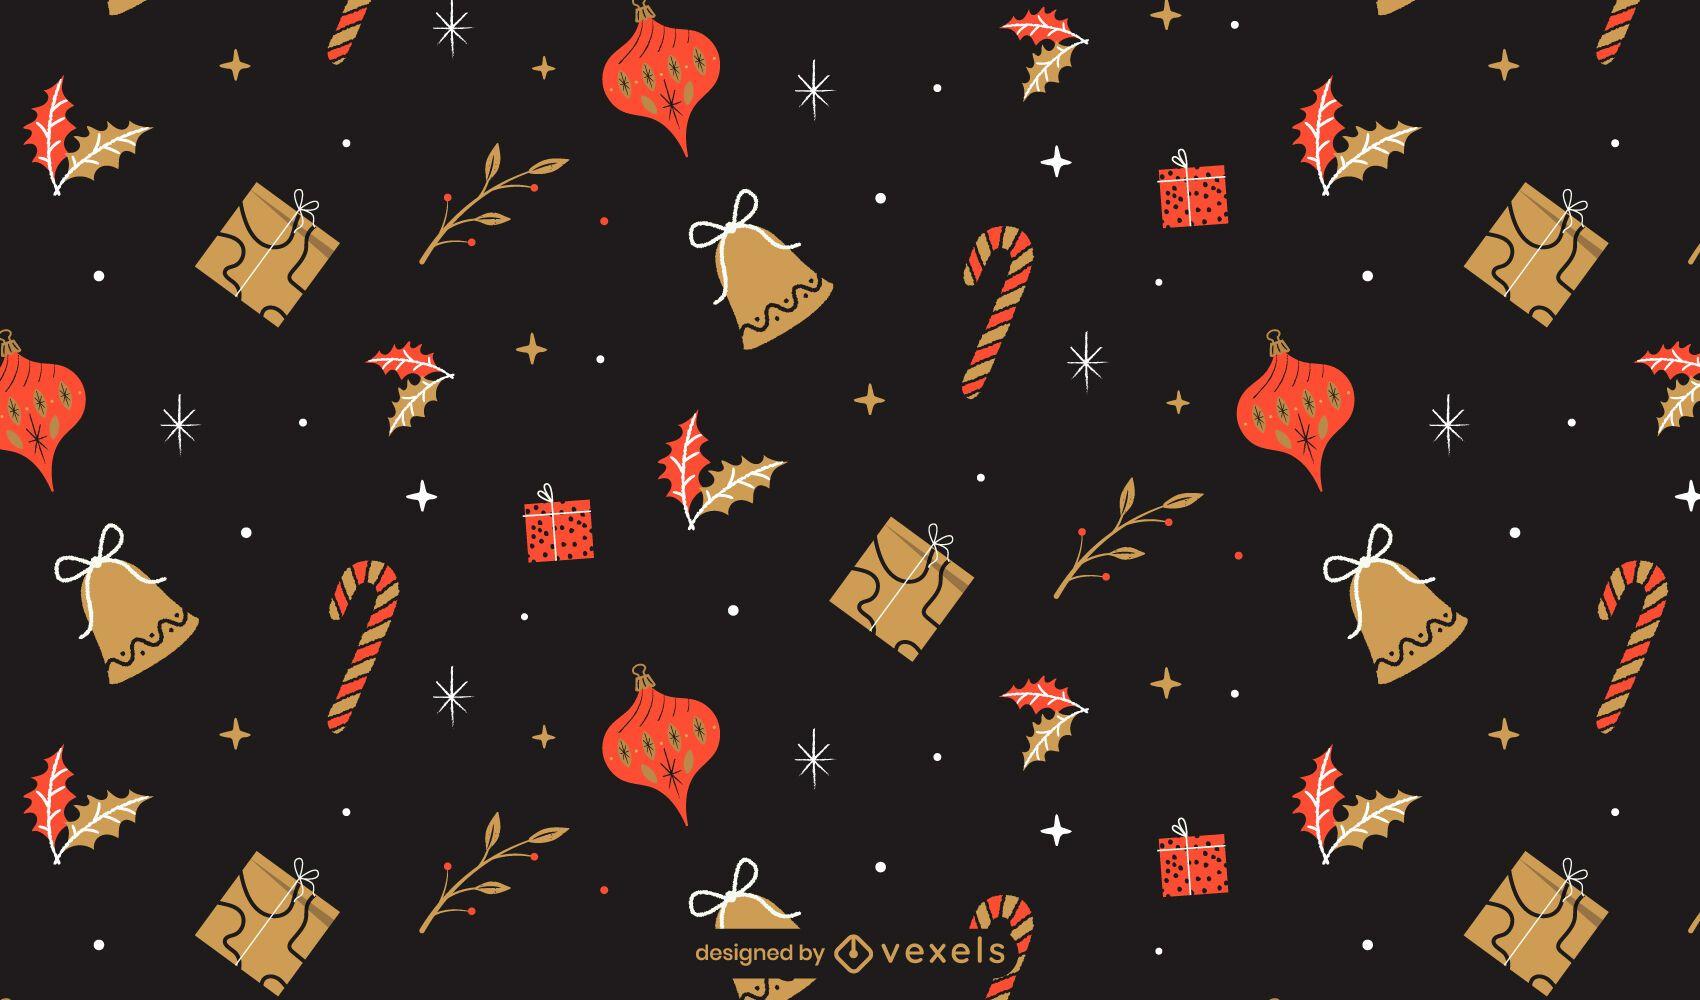 Xmas holiday pattern design